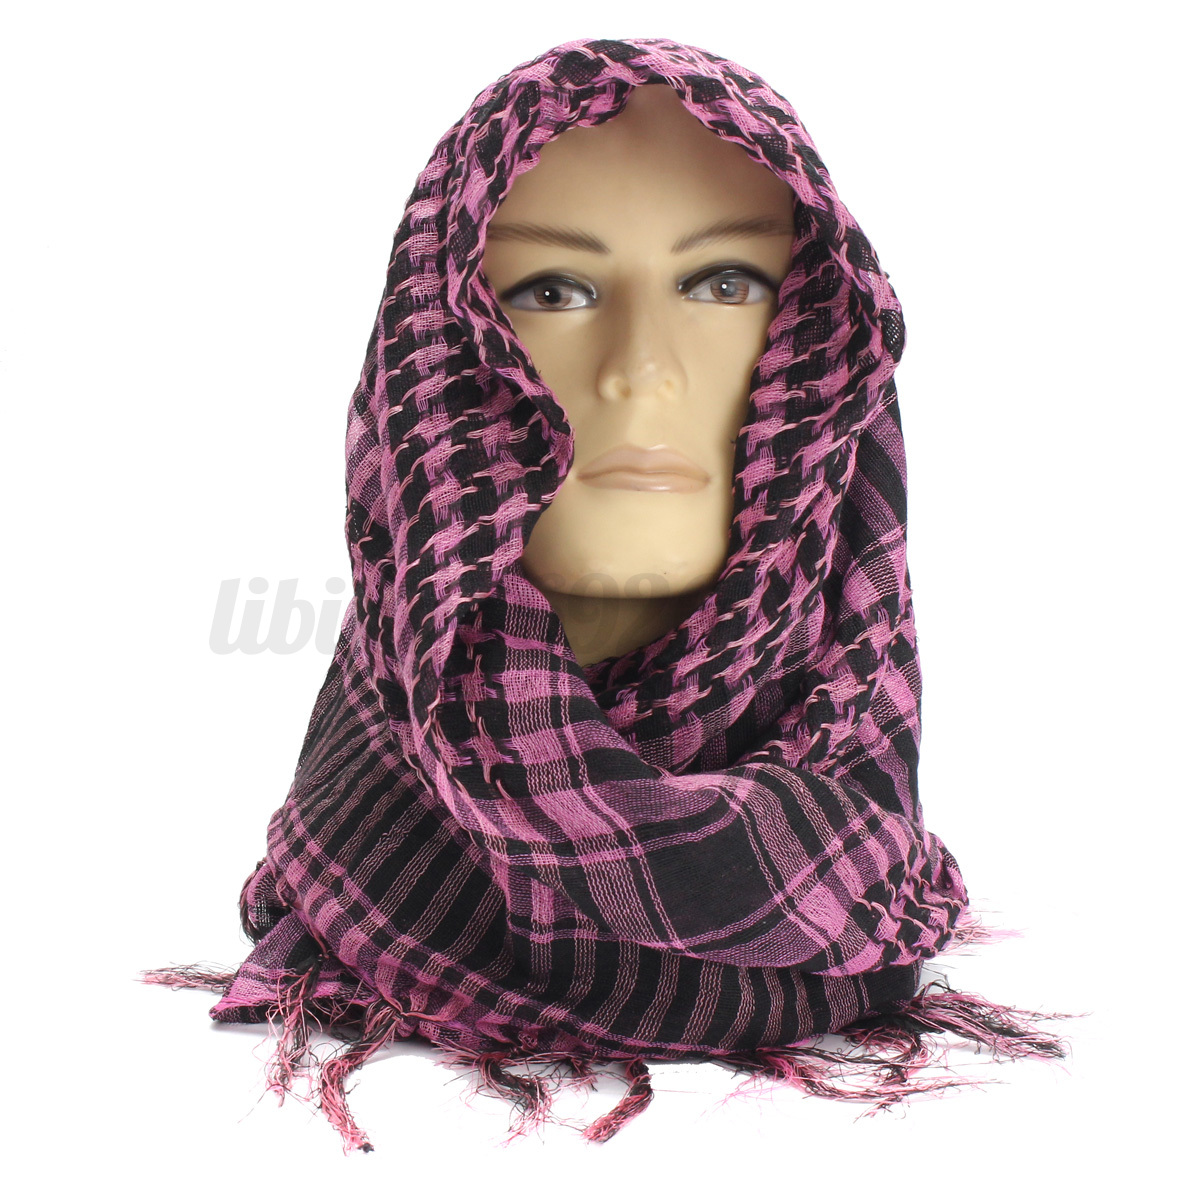 Shemagh-Militare-sciarpa-Tattico-Keffiyeh-Uomo-Donna-Scarf-Foulard-Kefiah-Araba miniatura 14